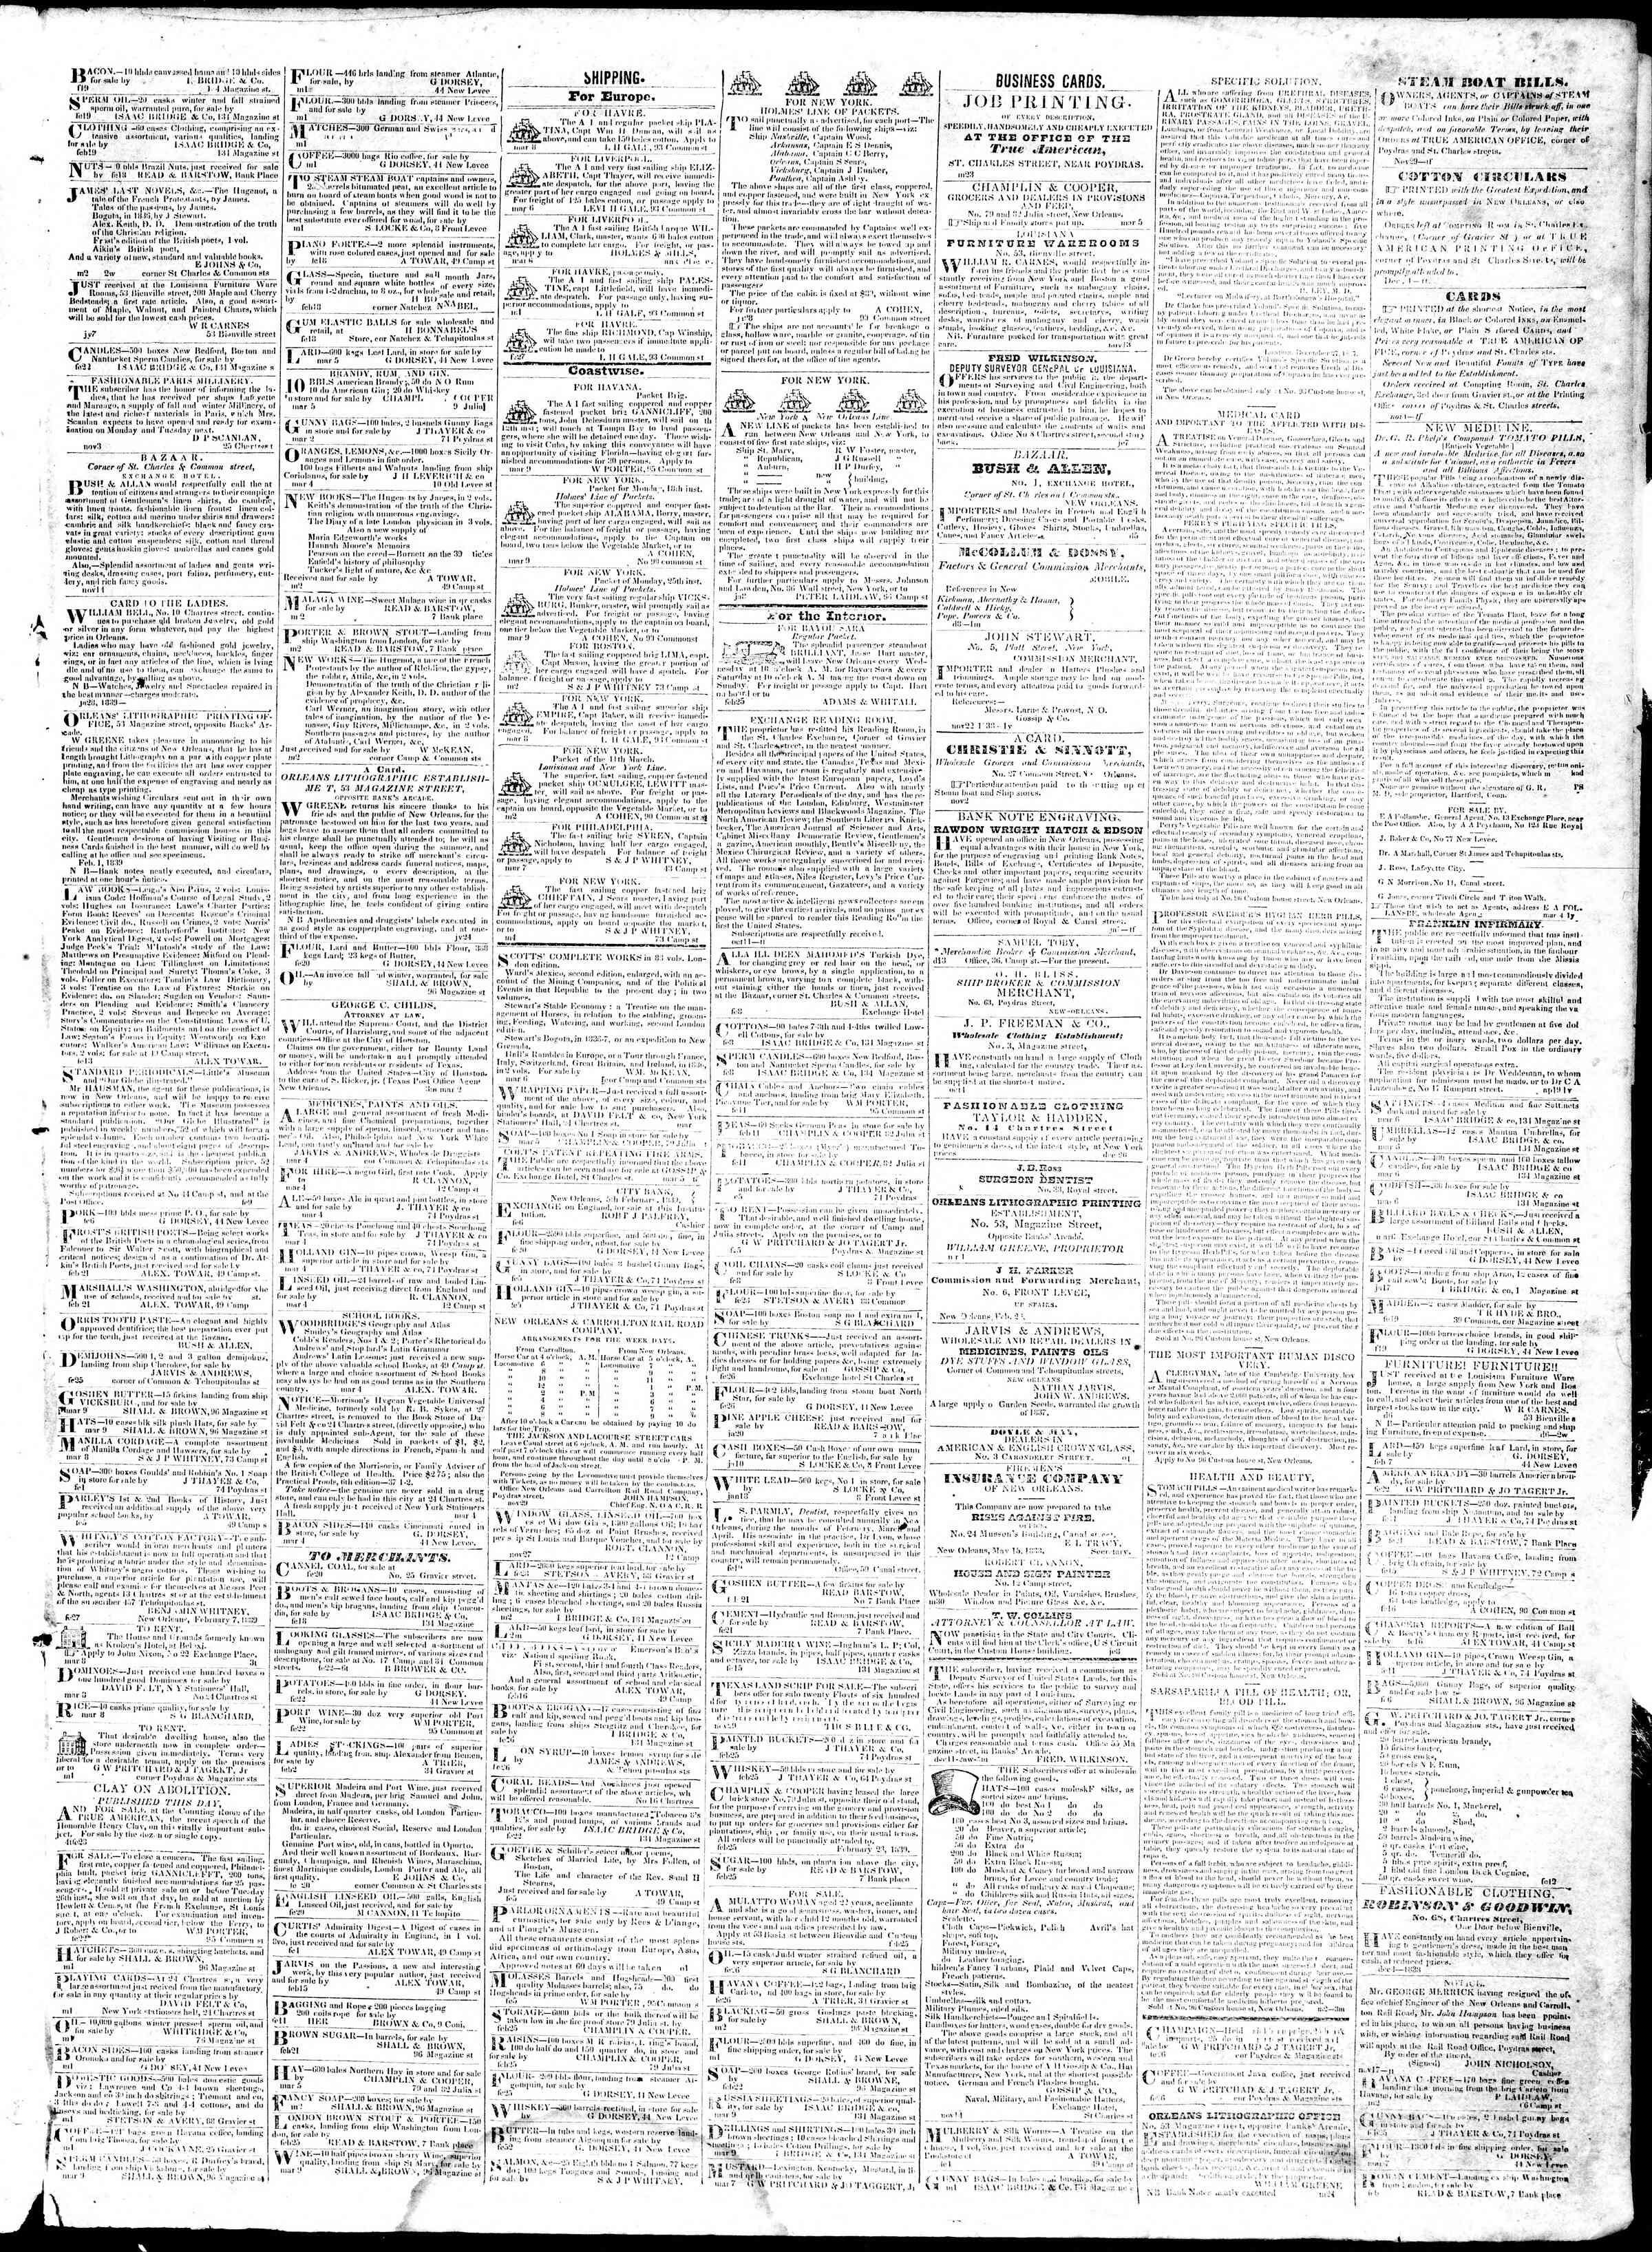 March 11, 1839 Tarihli True American Gazetesi Sayfa 3